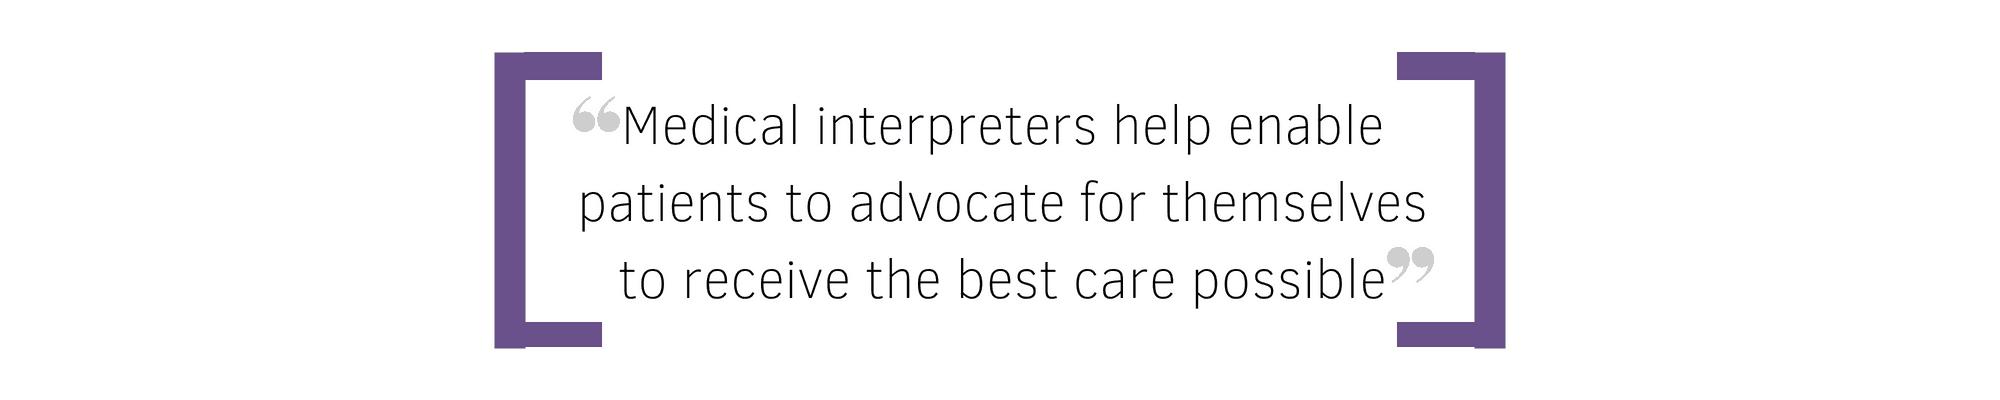 interpertation-helps-patients